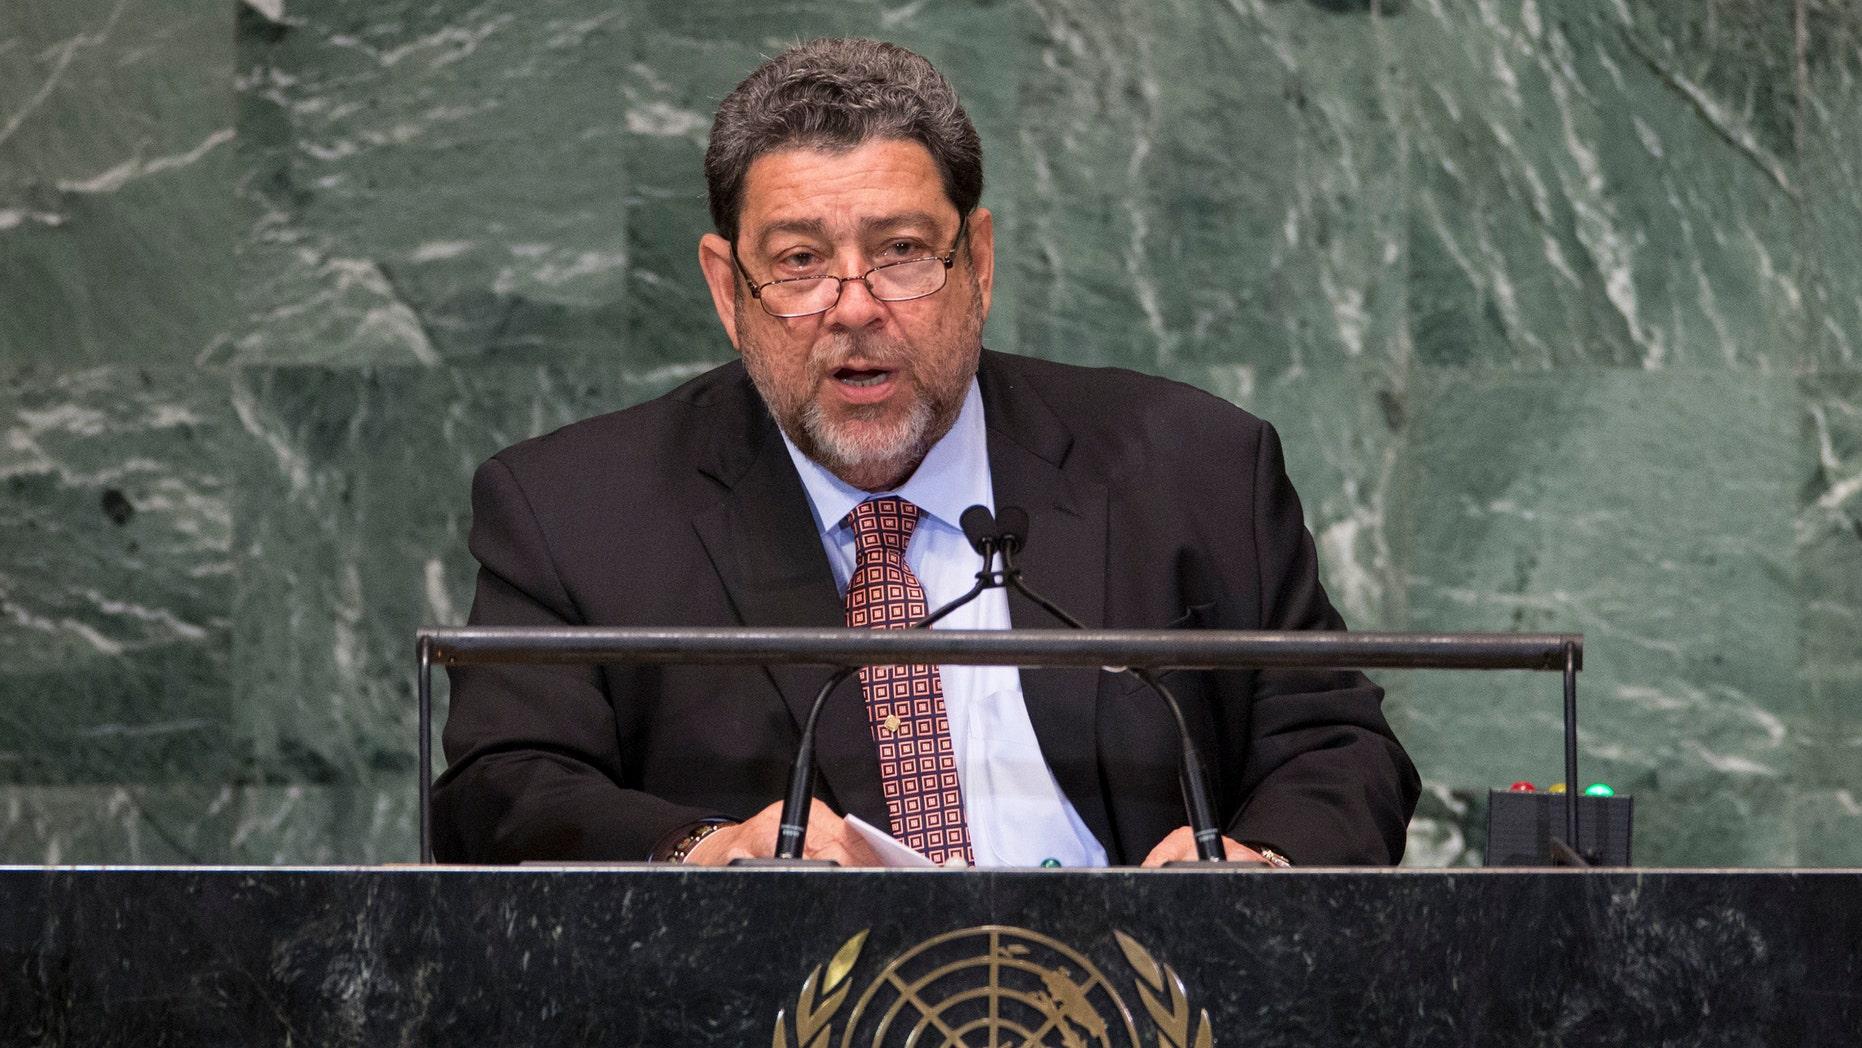 Saint Vincent and the Grenadines Prime Minister Ralph Gonsalves addresses the U.N. General Assembly.